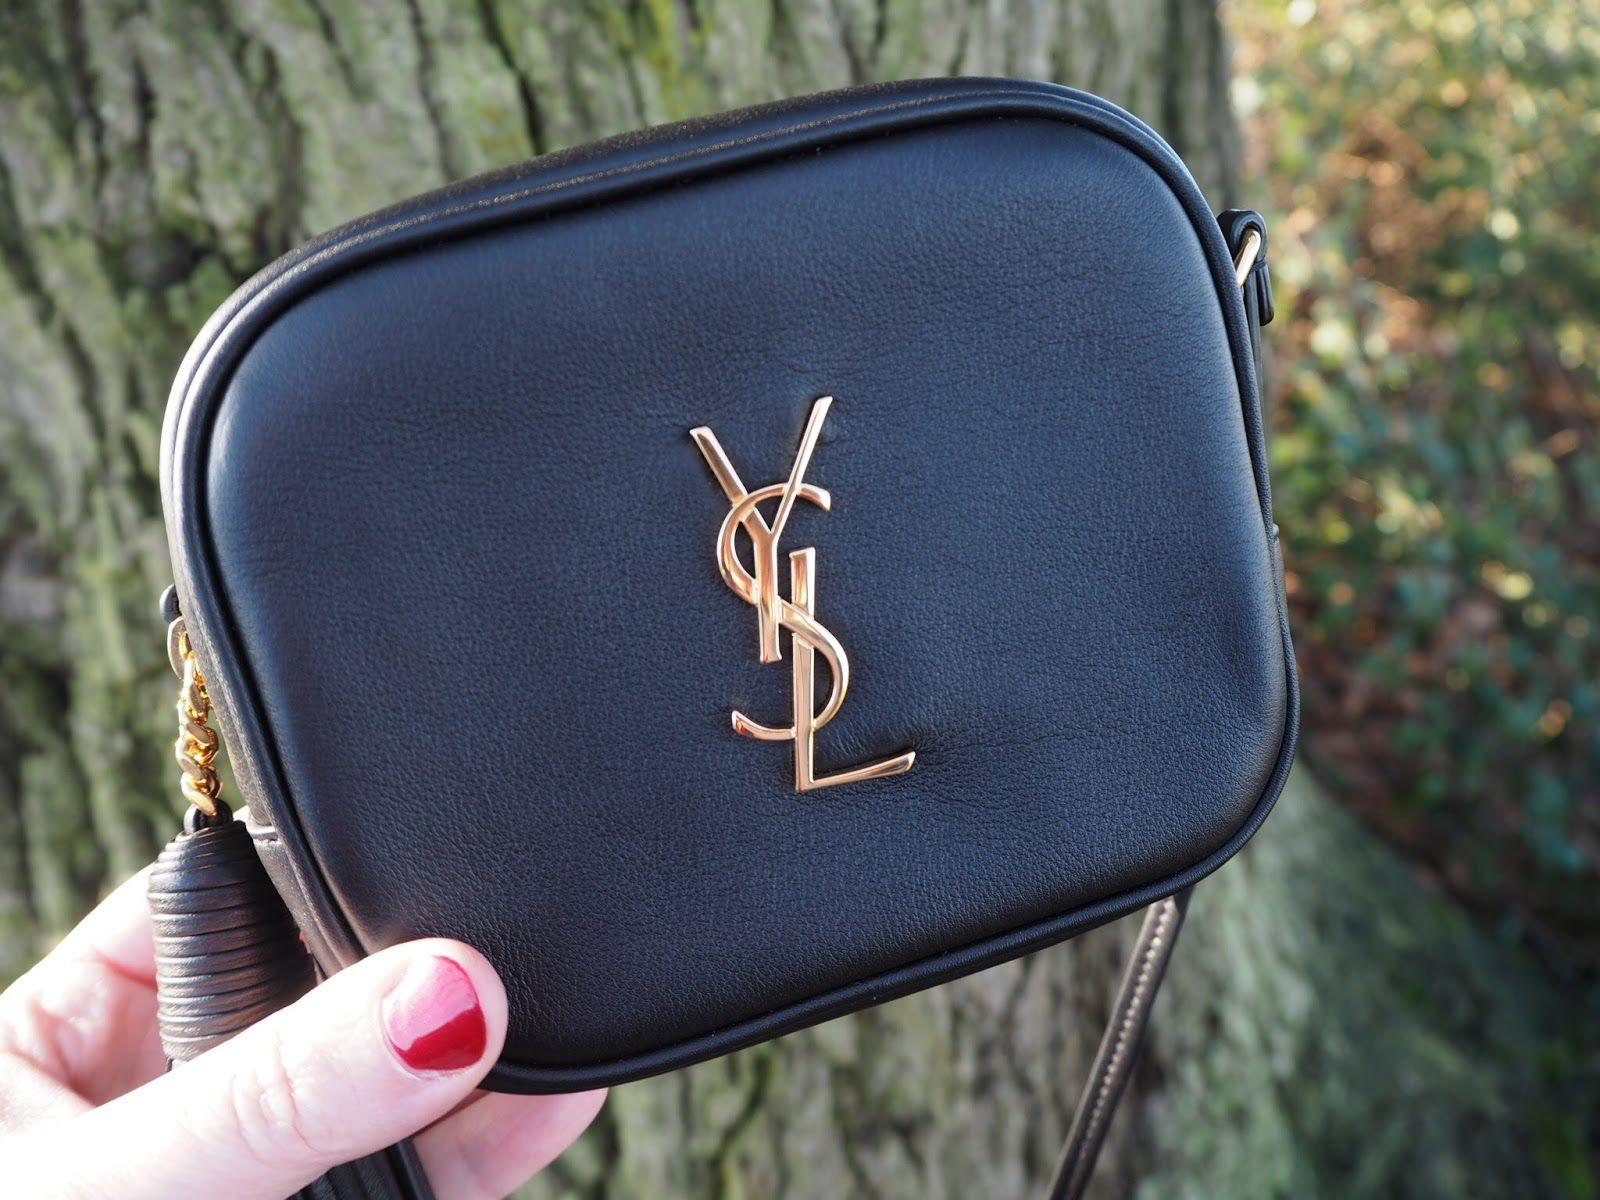 6cbe9285ef423 The YSL Blogger Bag  Worth The Money